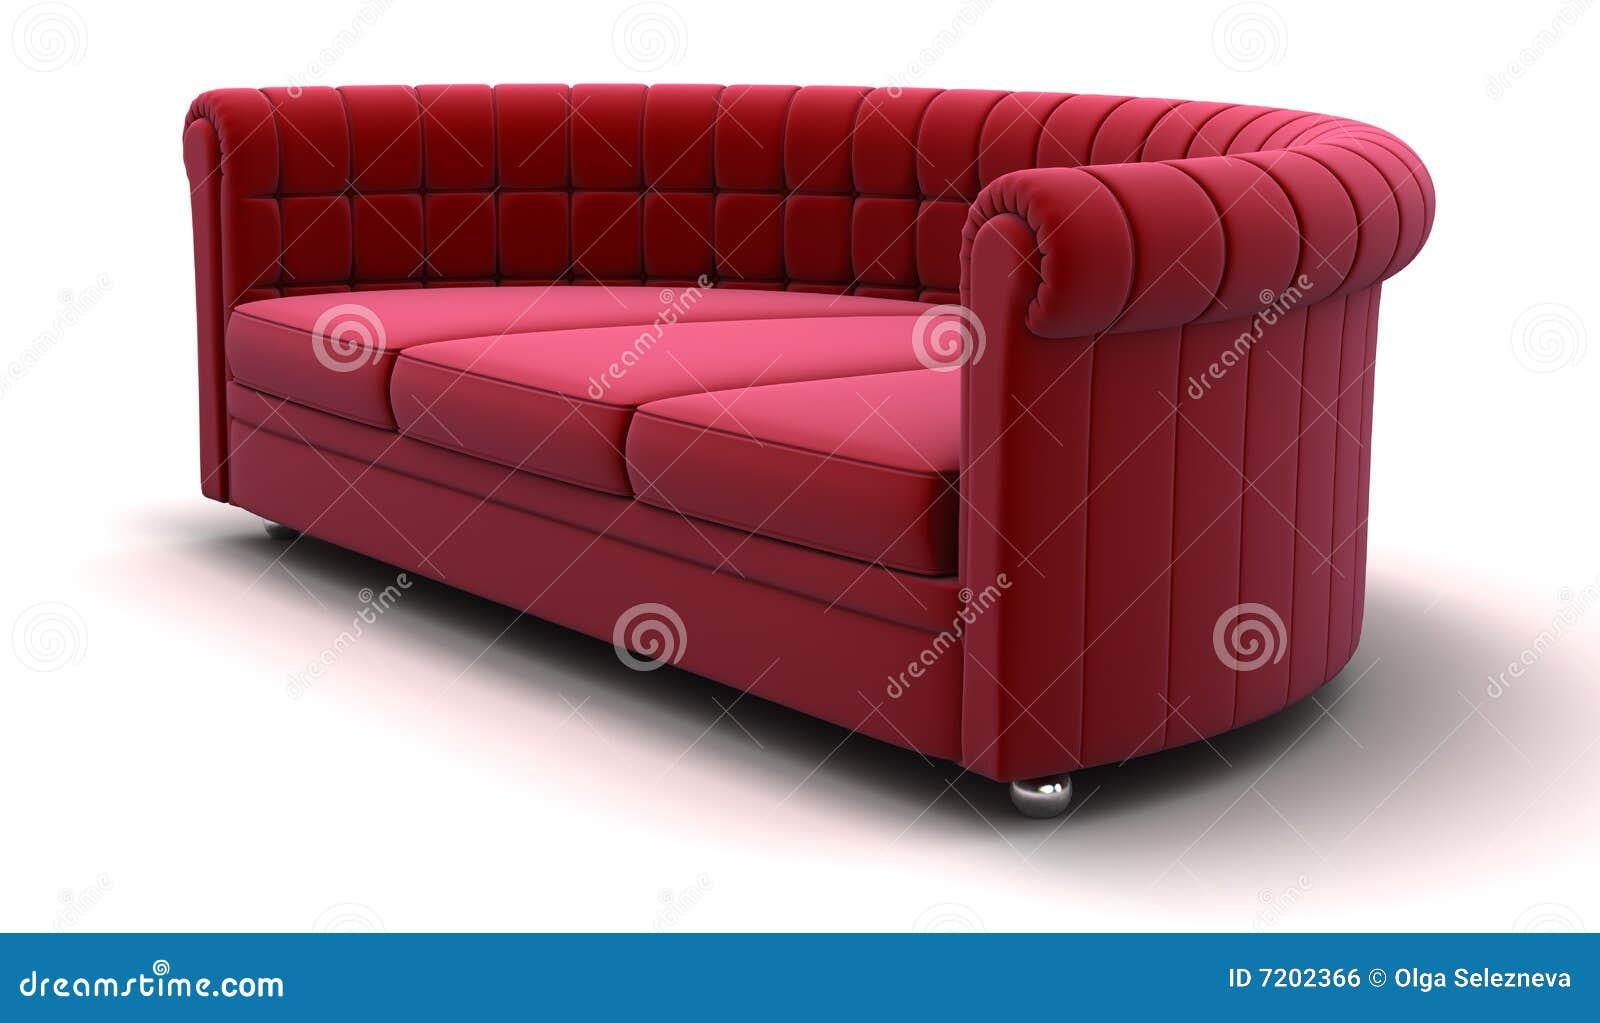 rotes sofa stock abbildung illustration von wohnung. Black Bedroom Furniture Sets. Home Design Ideas